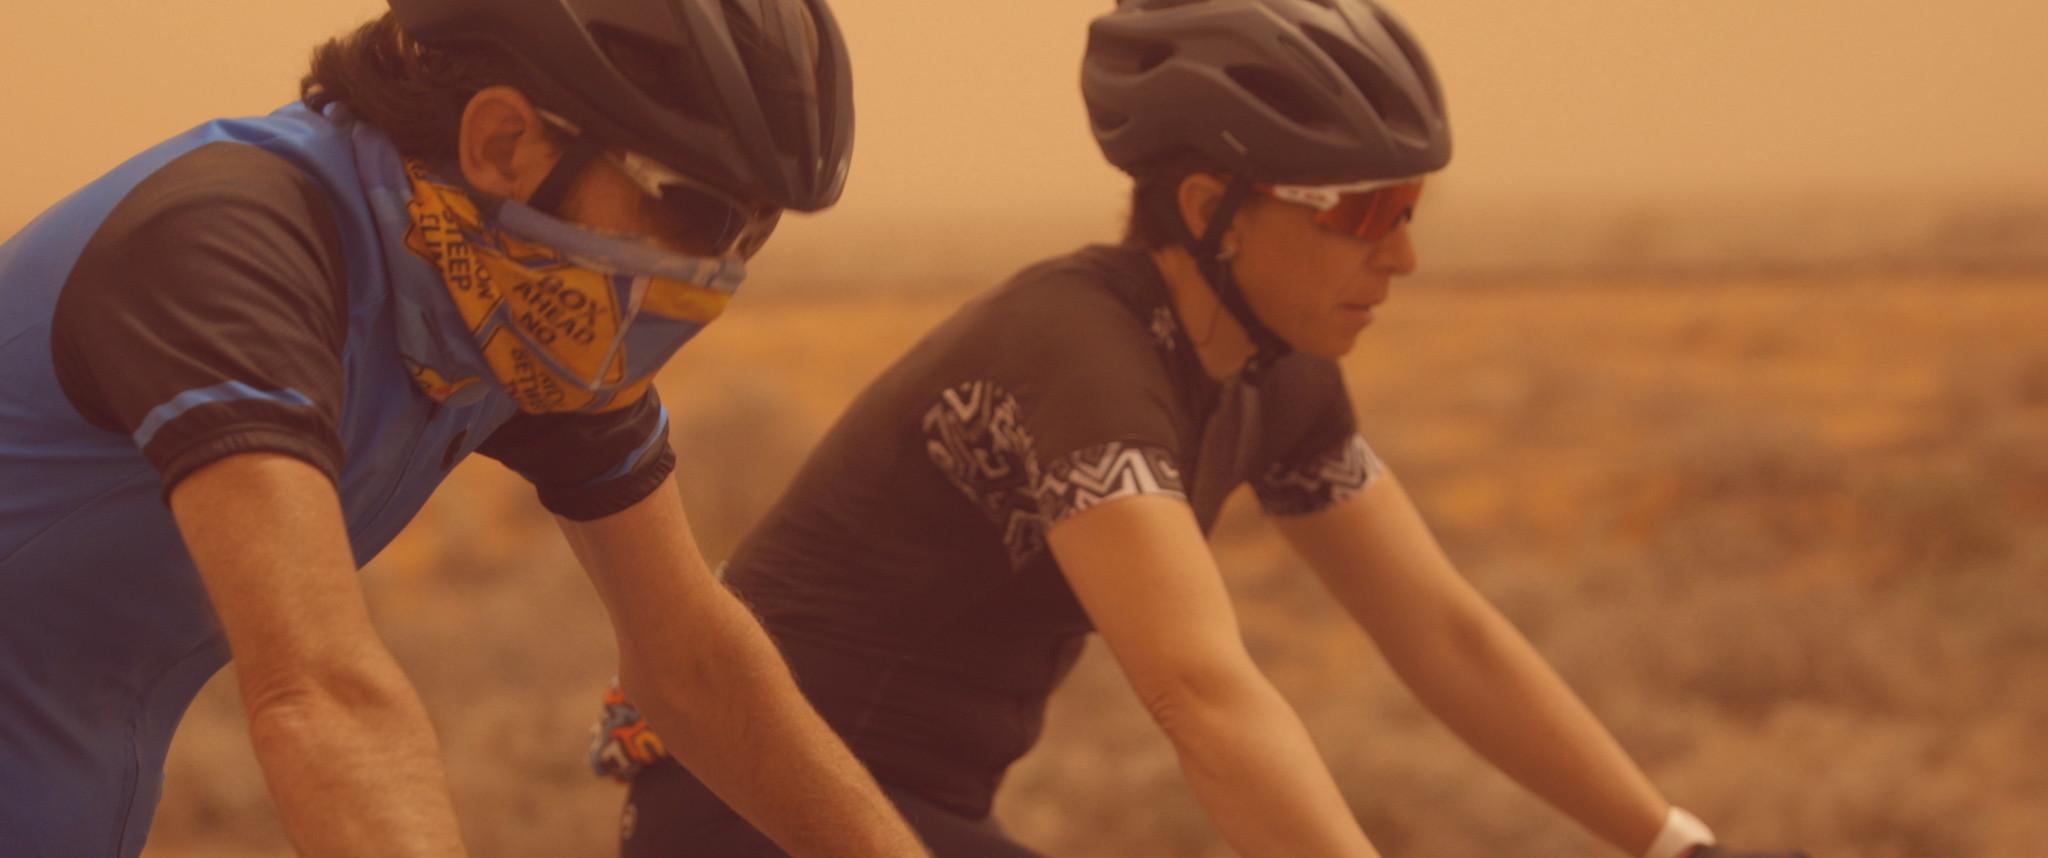 Riding through the Dust storm II.jpg